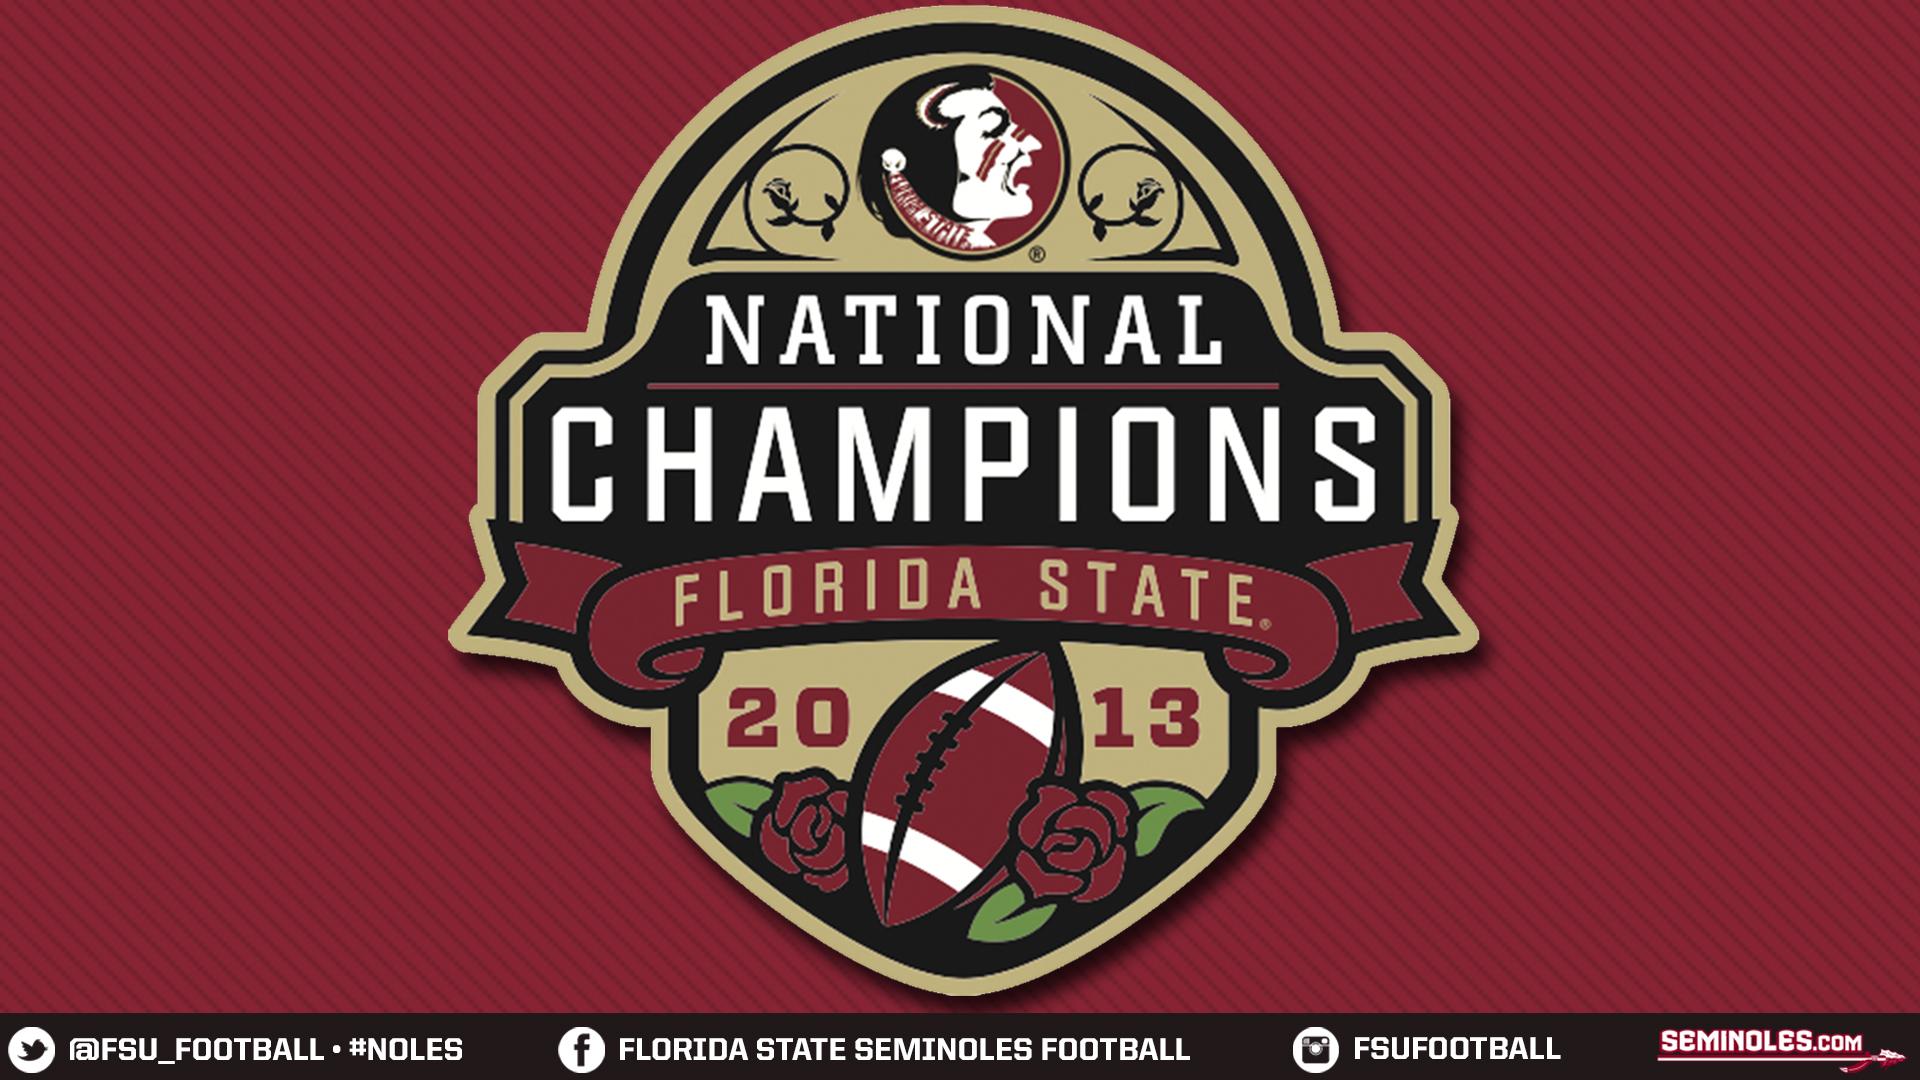 Cool Fsu Football Logo Florida state wallpaper 1920x1080